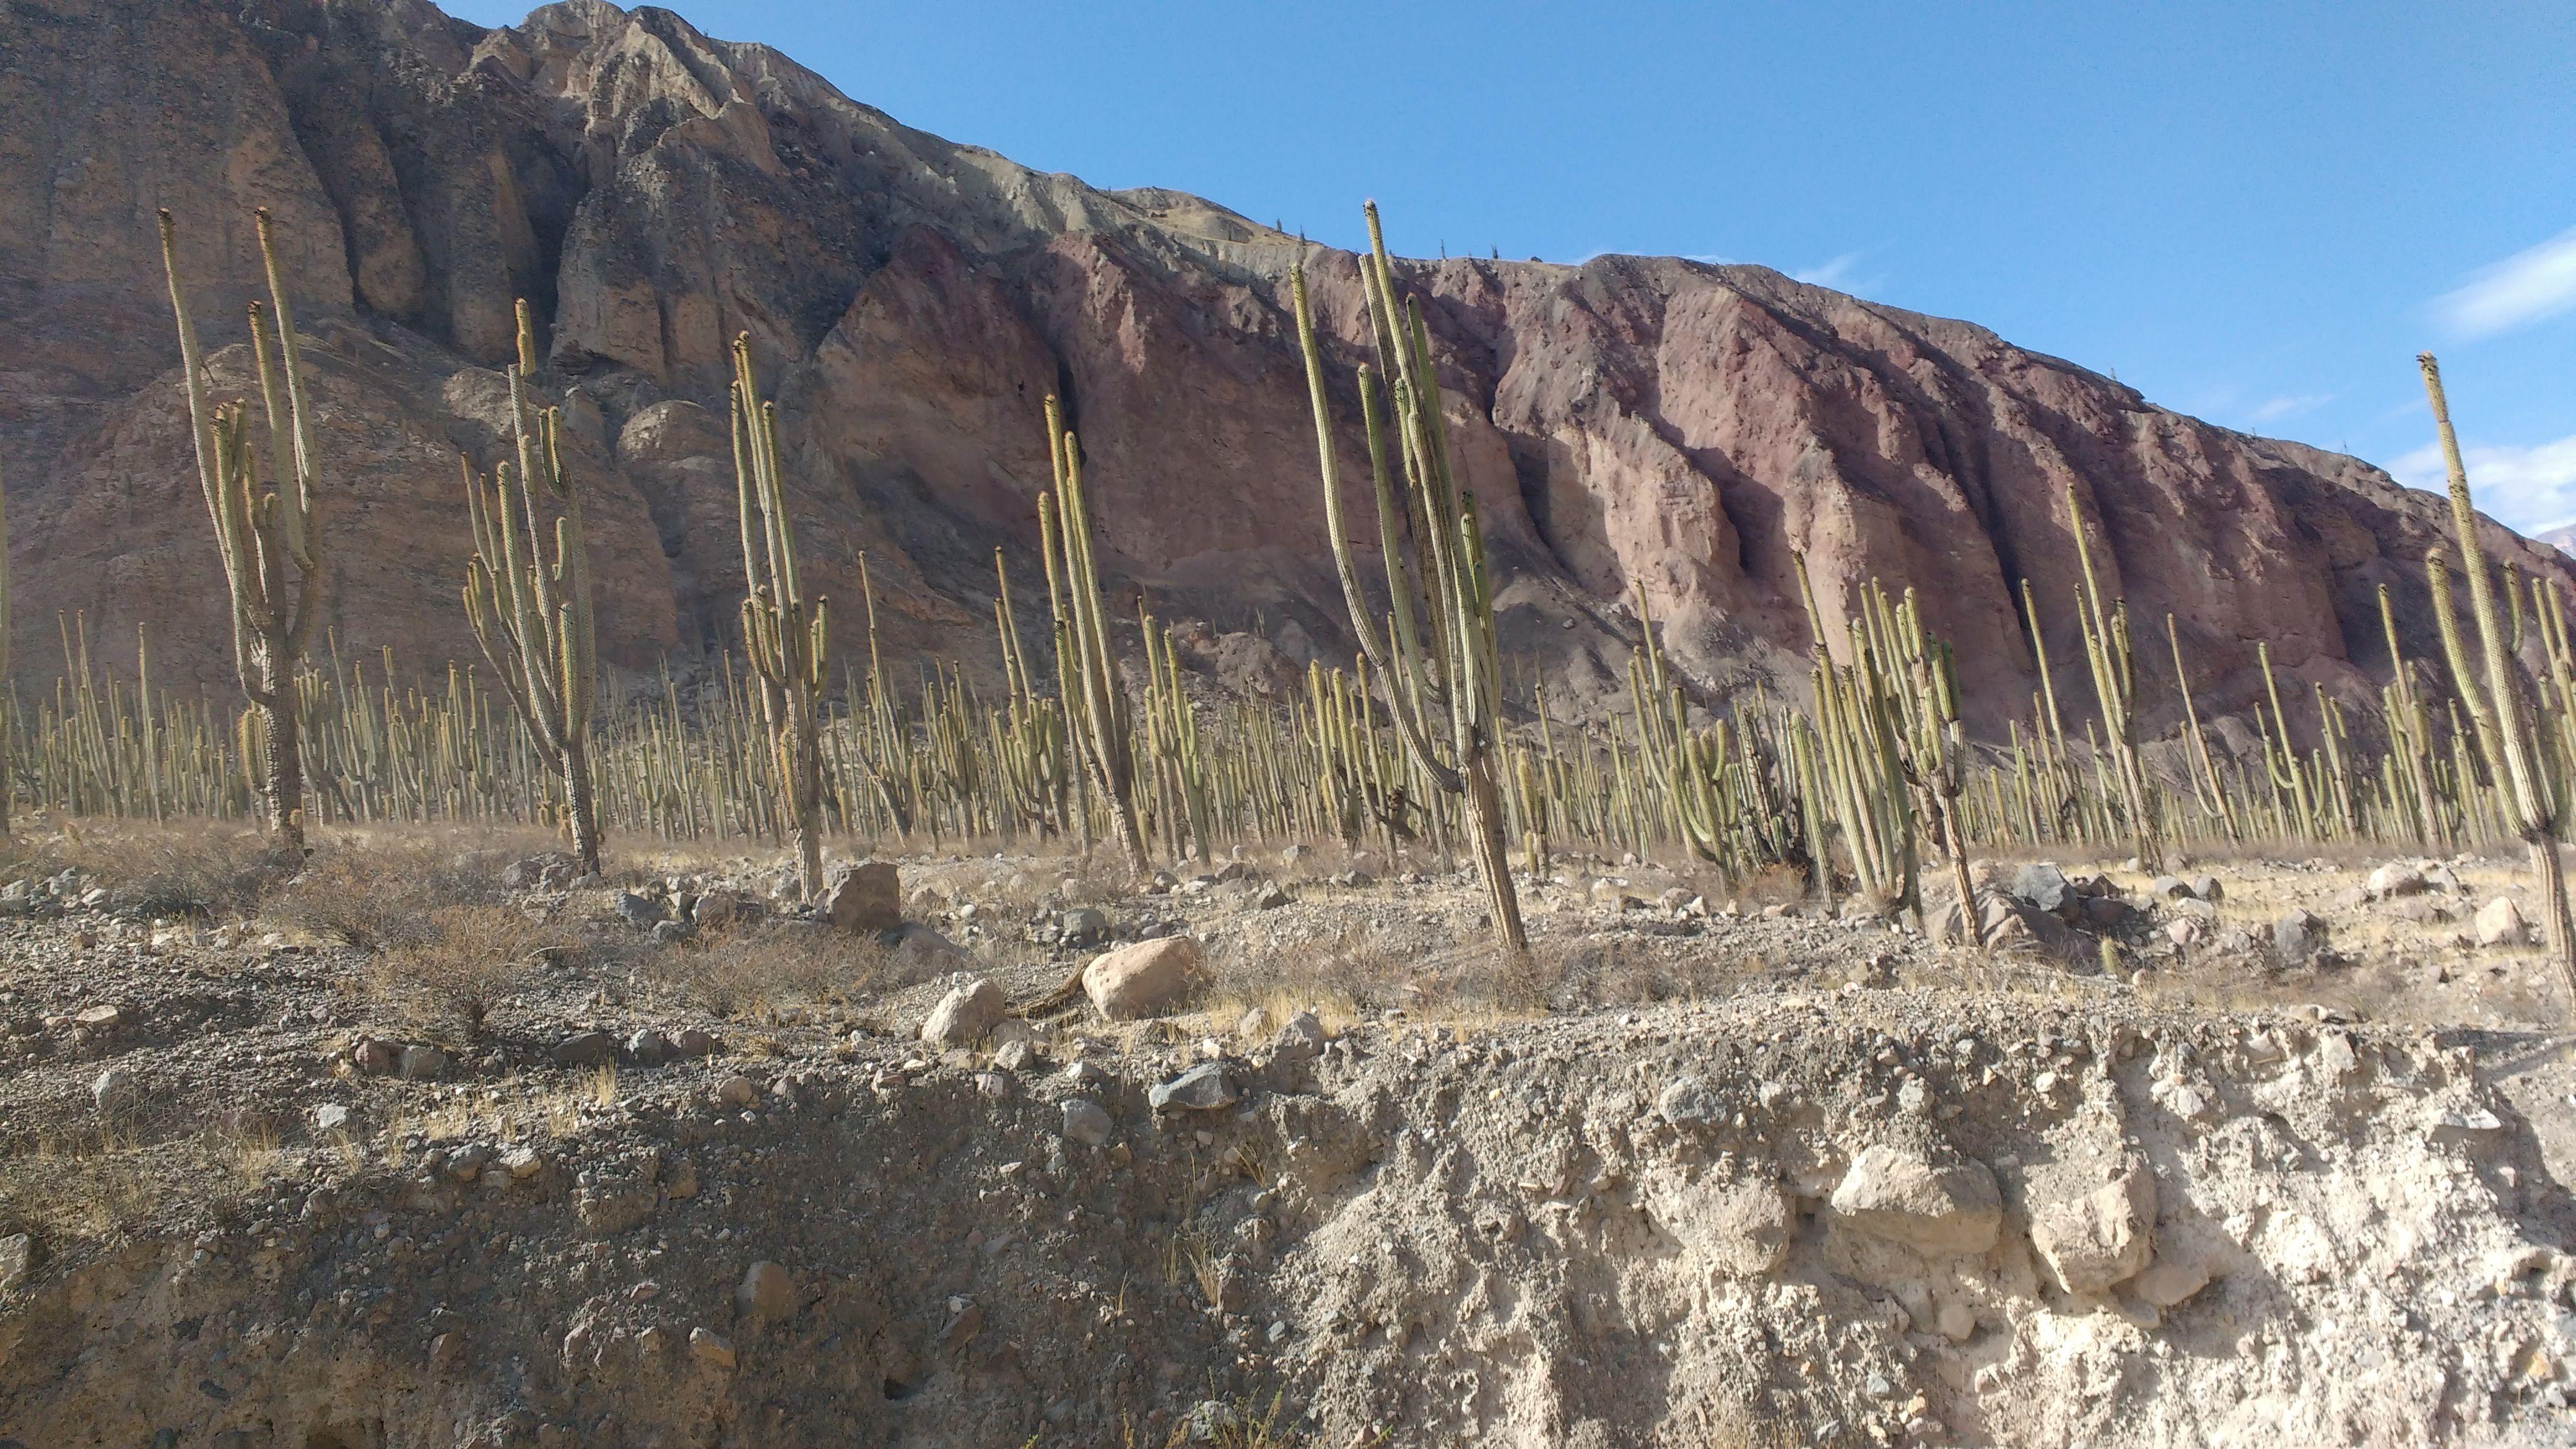 Bosque de cactus de Judío Pampa